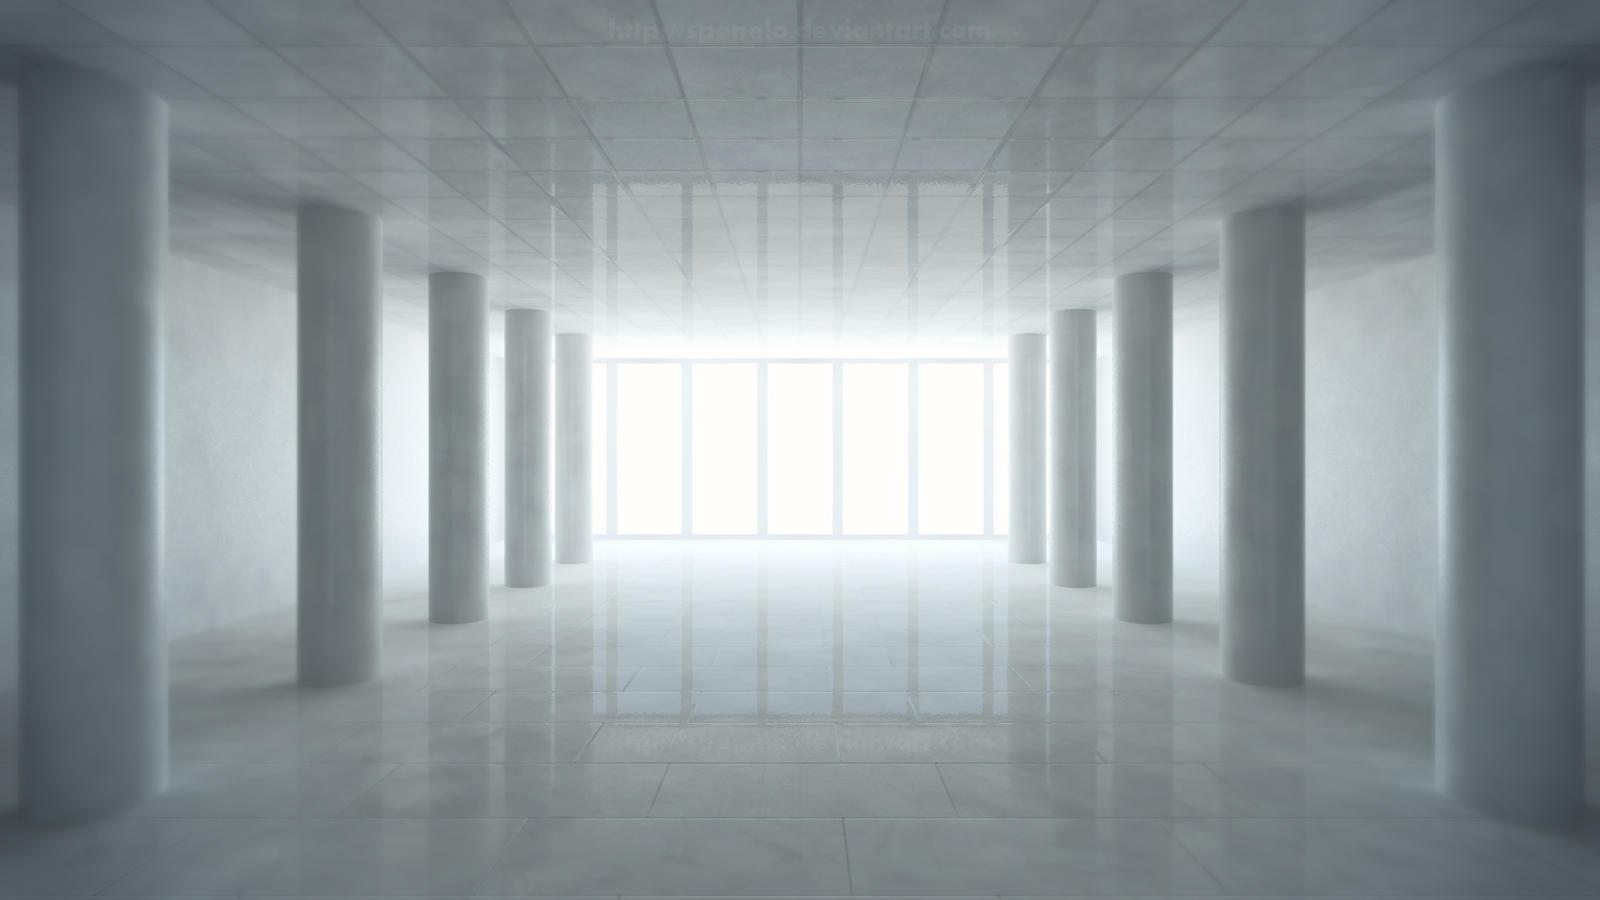 Heavenly corridor by spenelo on deviantart - Wallpaper corridor ...